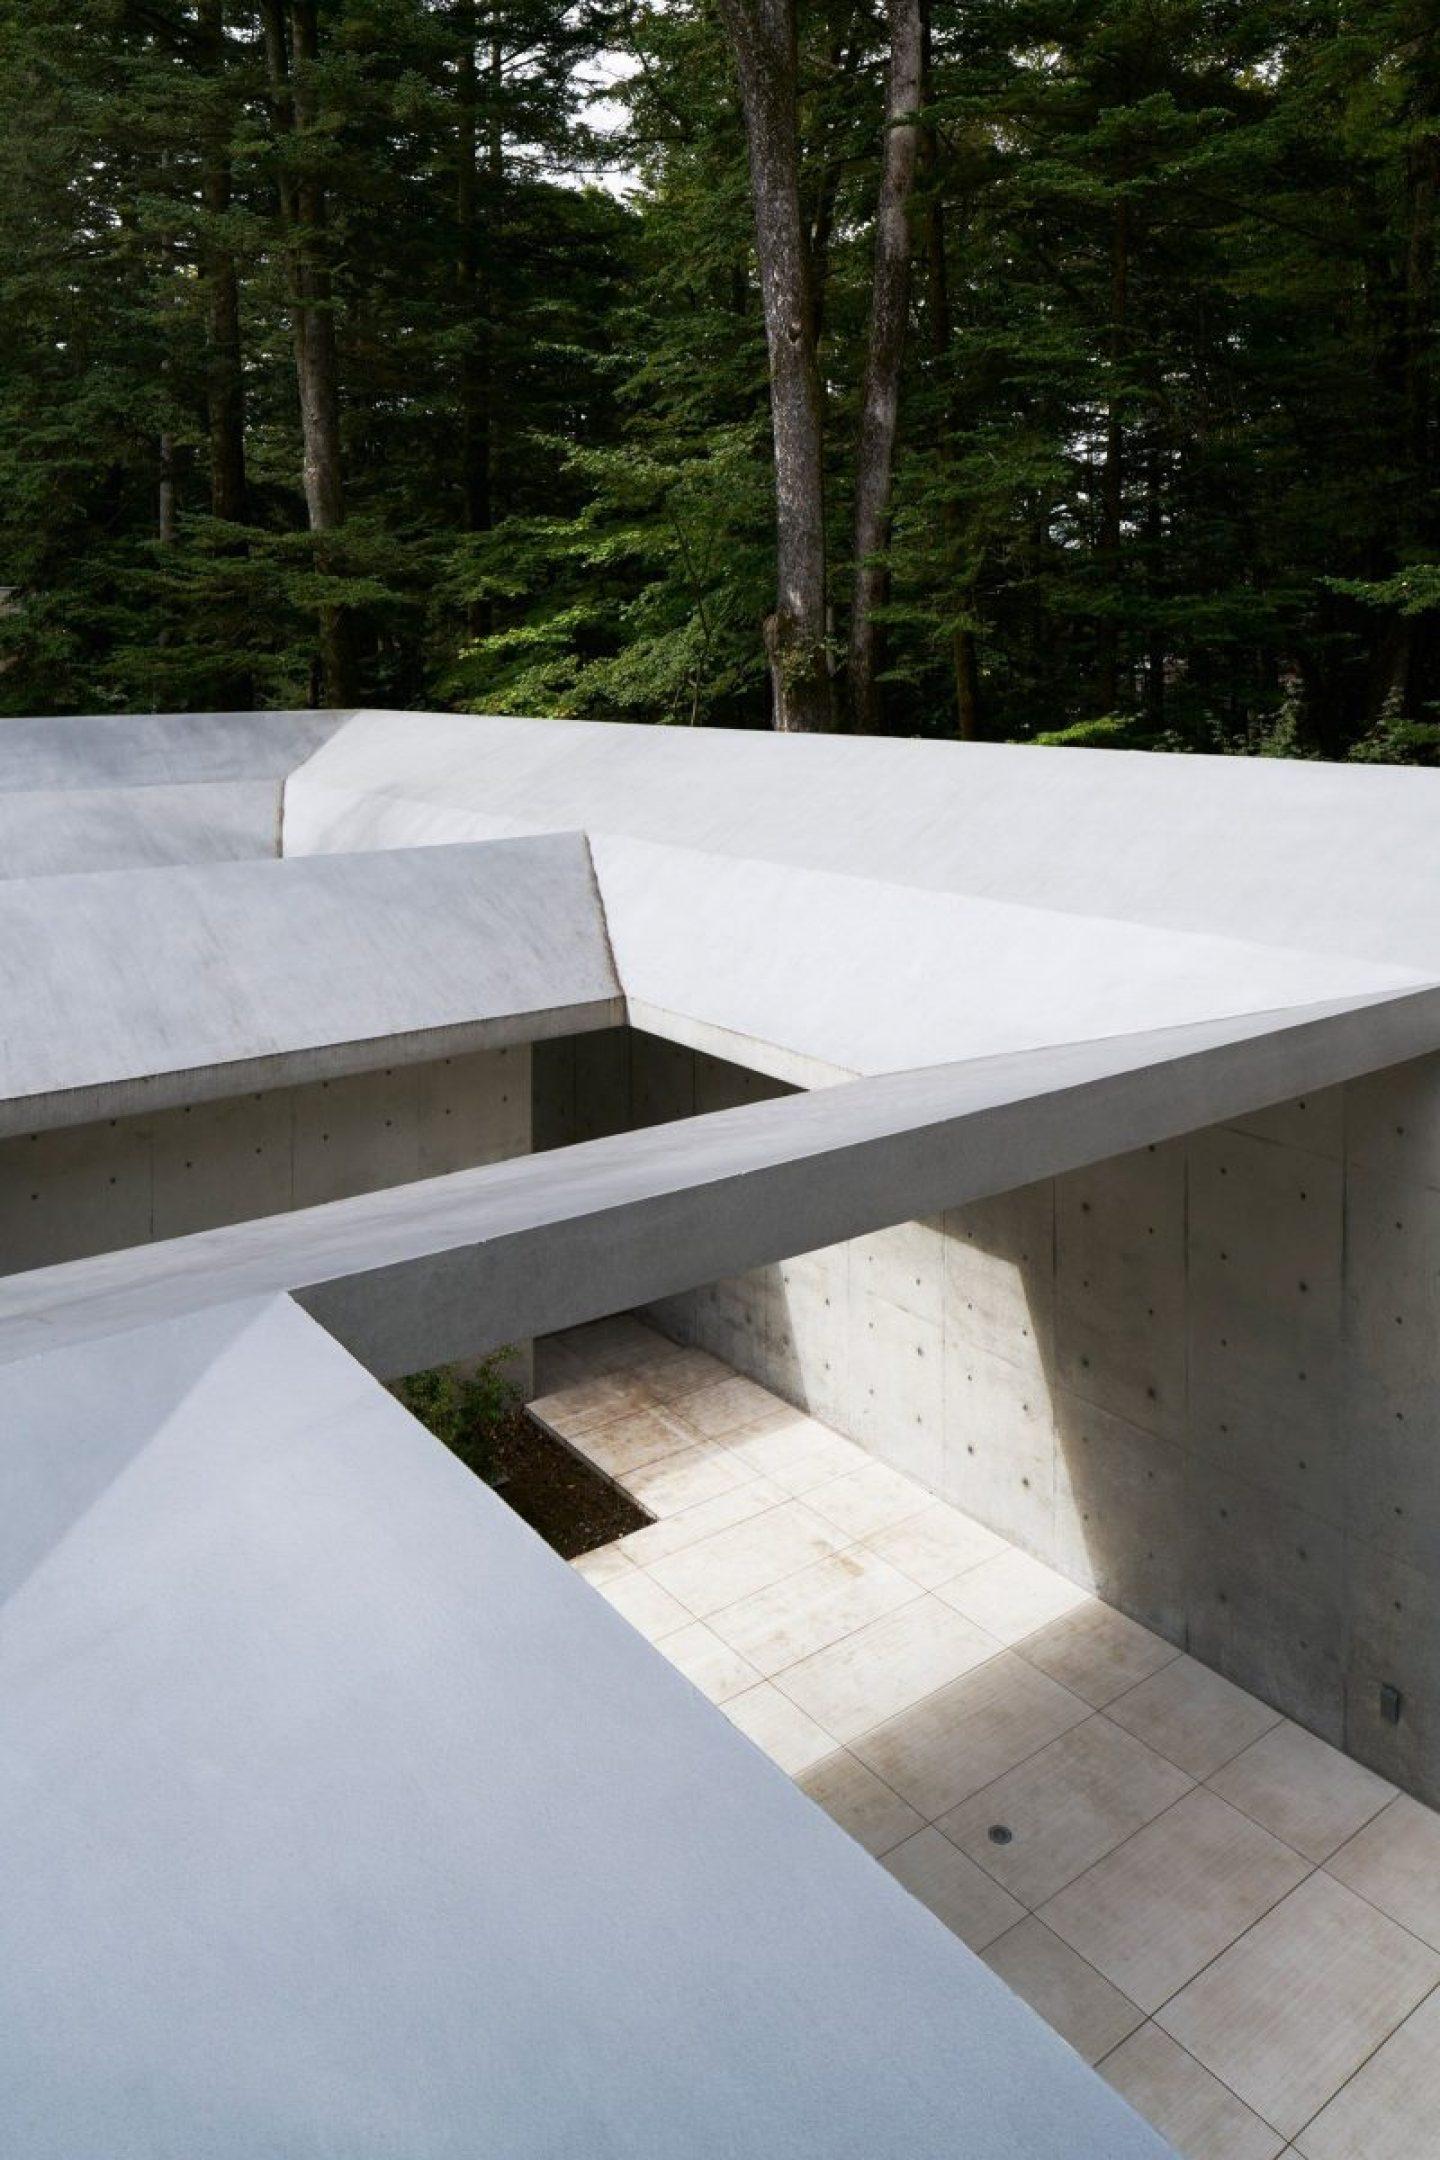 Matsubara_Ariyama_Architecture (12)